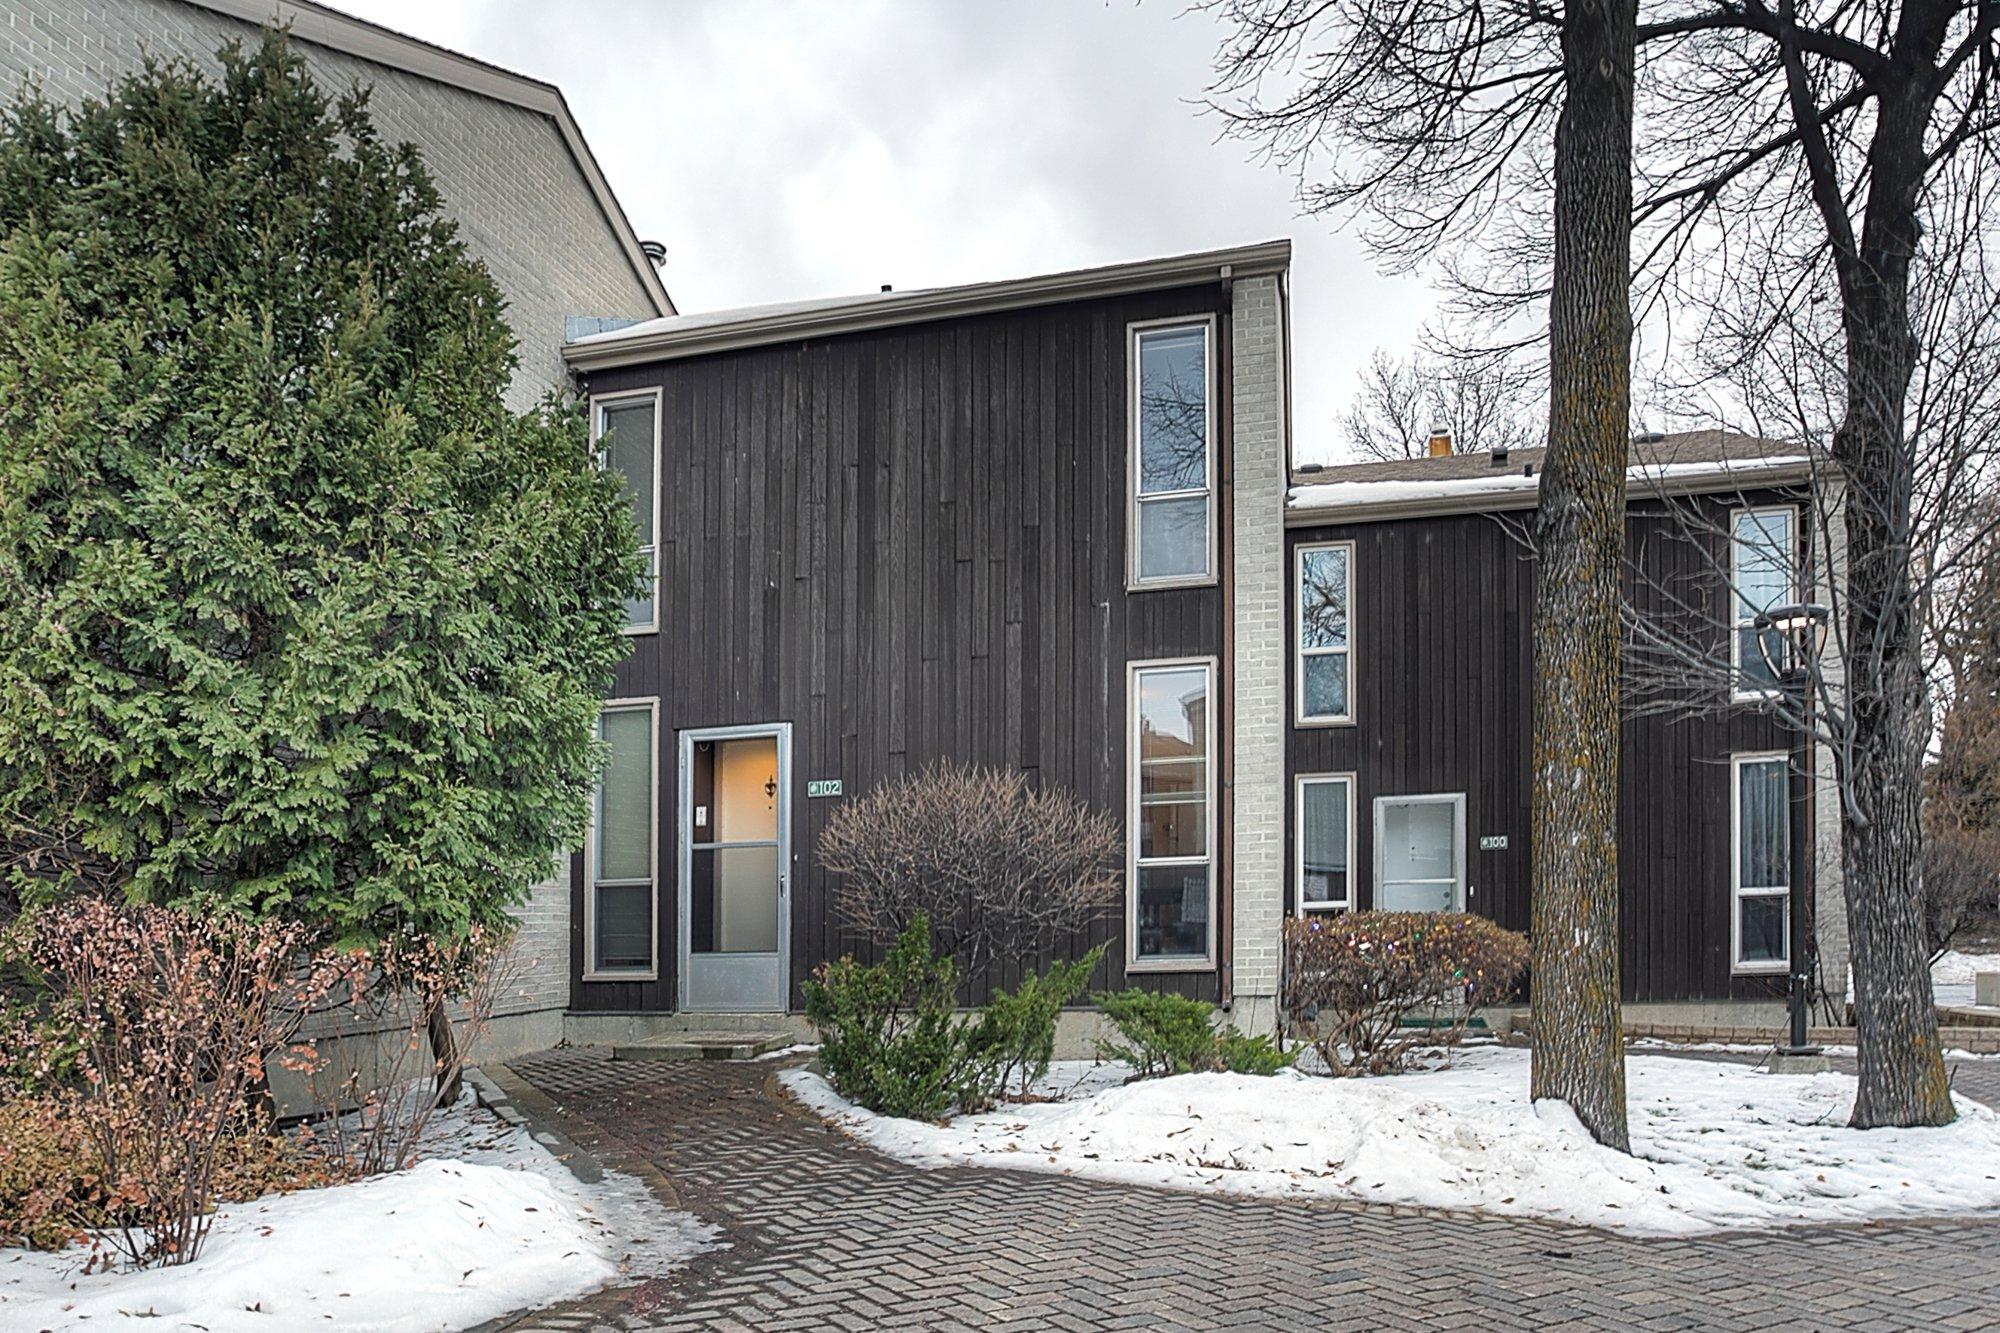 Main Photo: 102 1 Snow Street in Winnipeg: University Heights Townhouse for sale (1K)  : MLS®# 1730024